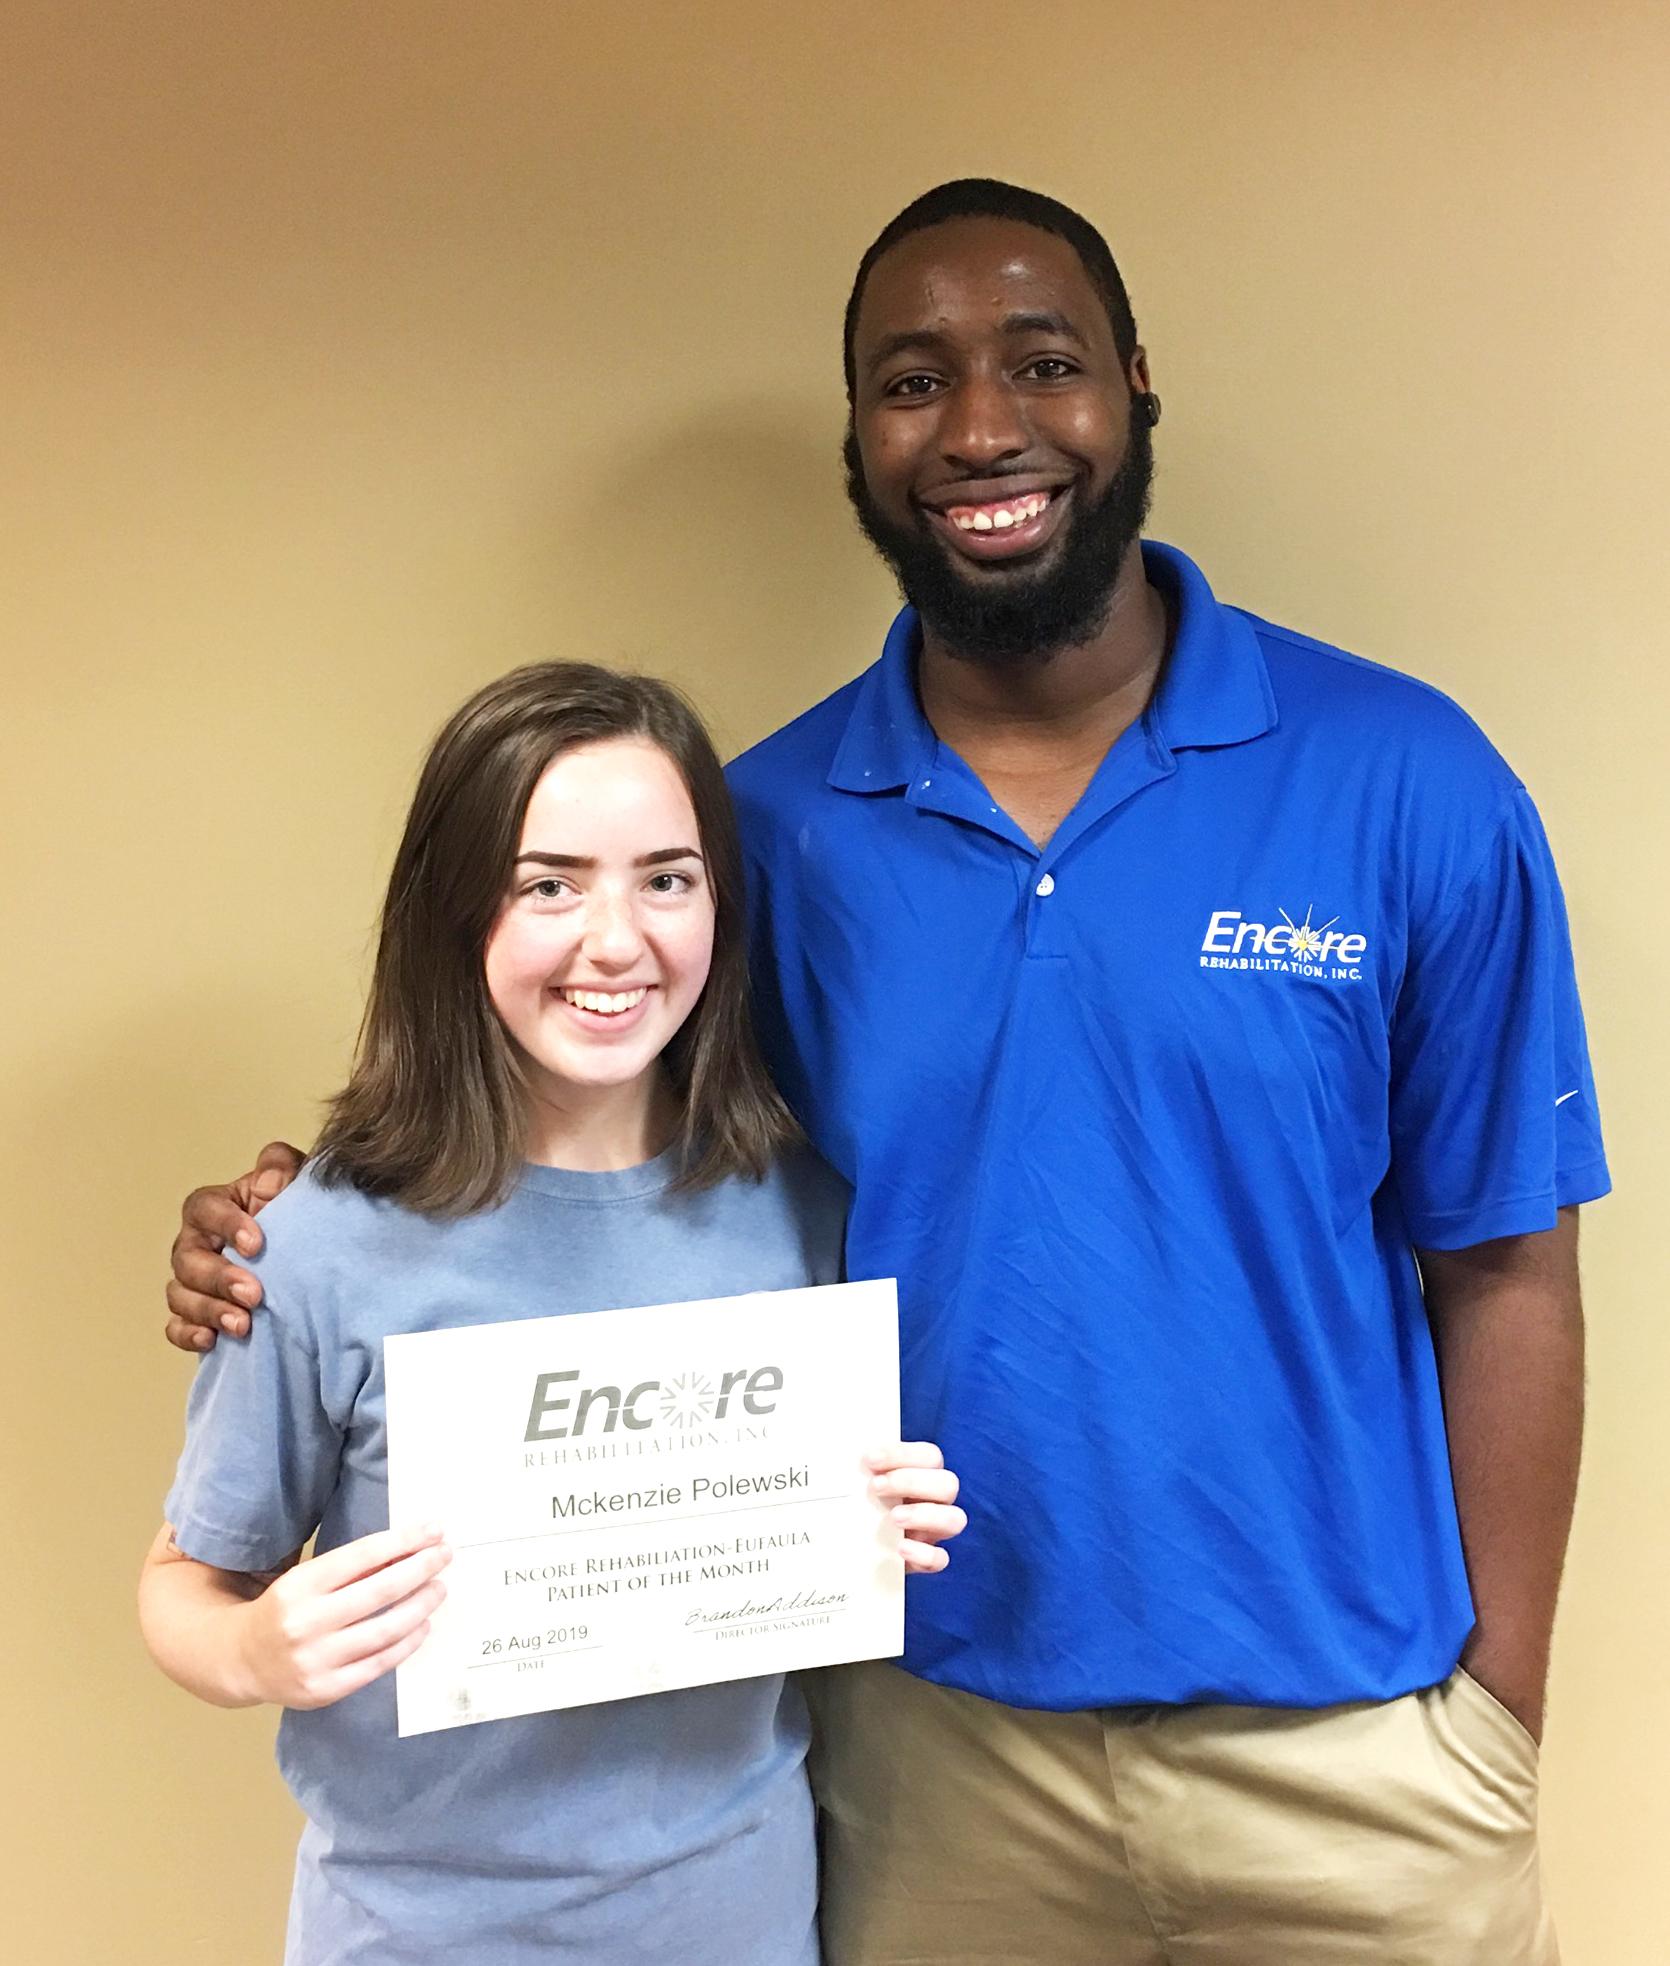 McKenzie Polewski is Athlete of the Month for Encore Rehabilitation-Eufaula #EncoreRehab